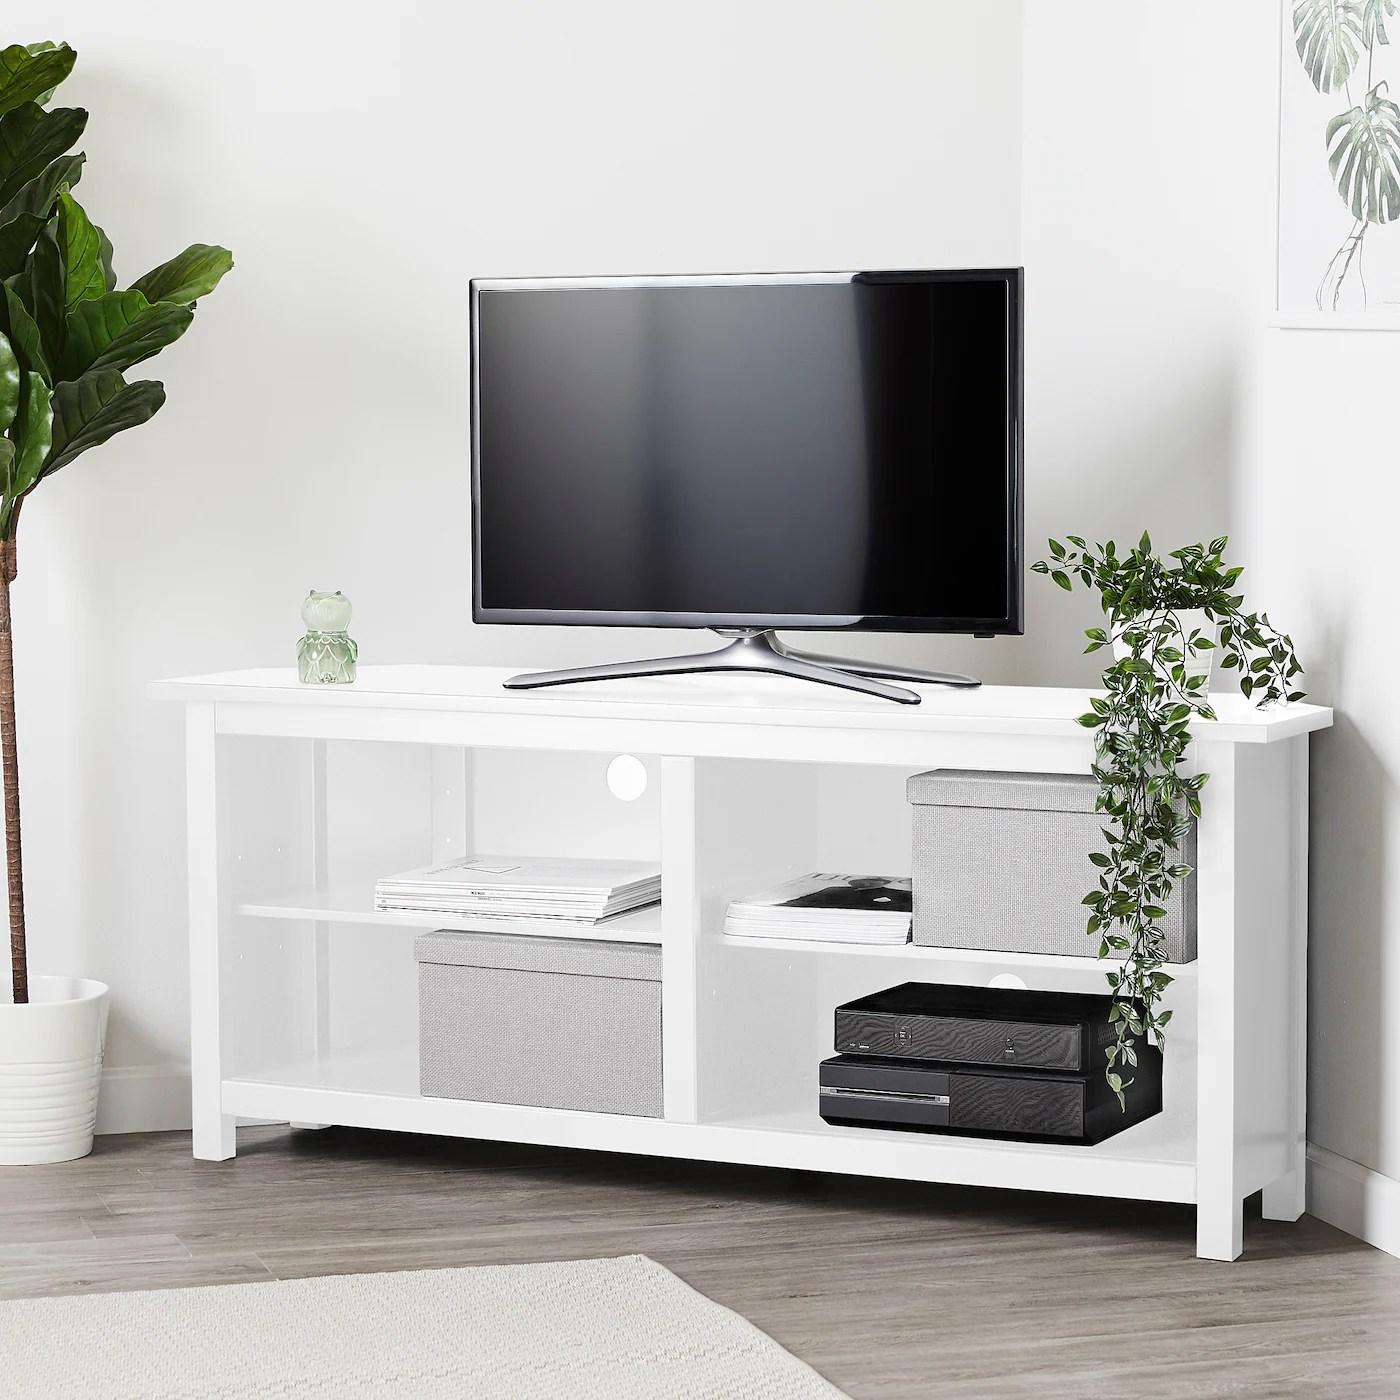 hemnes meuble tele d angle blanc 57 7 8x24 147x61 cm